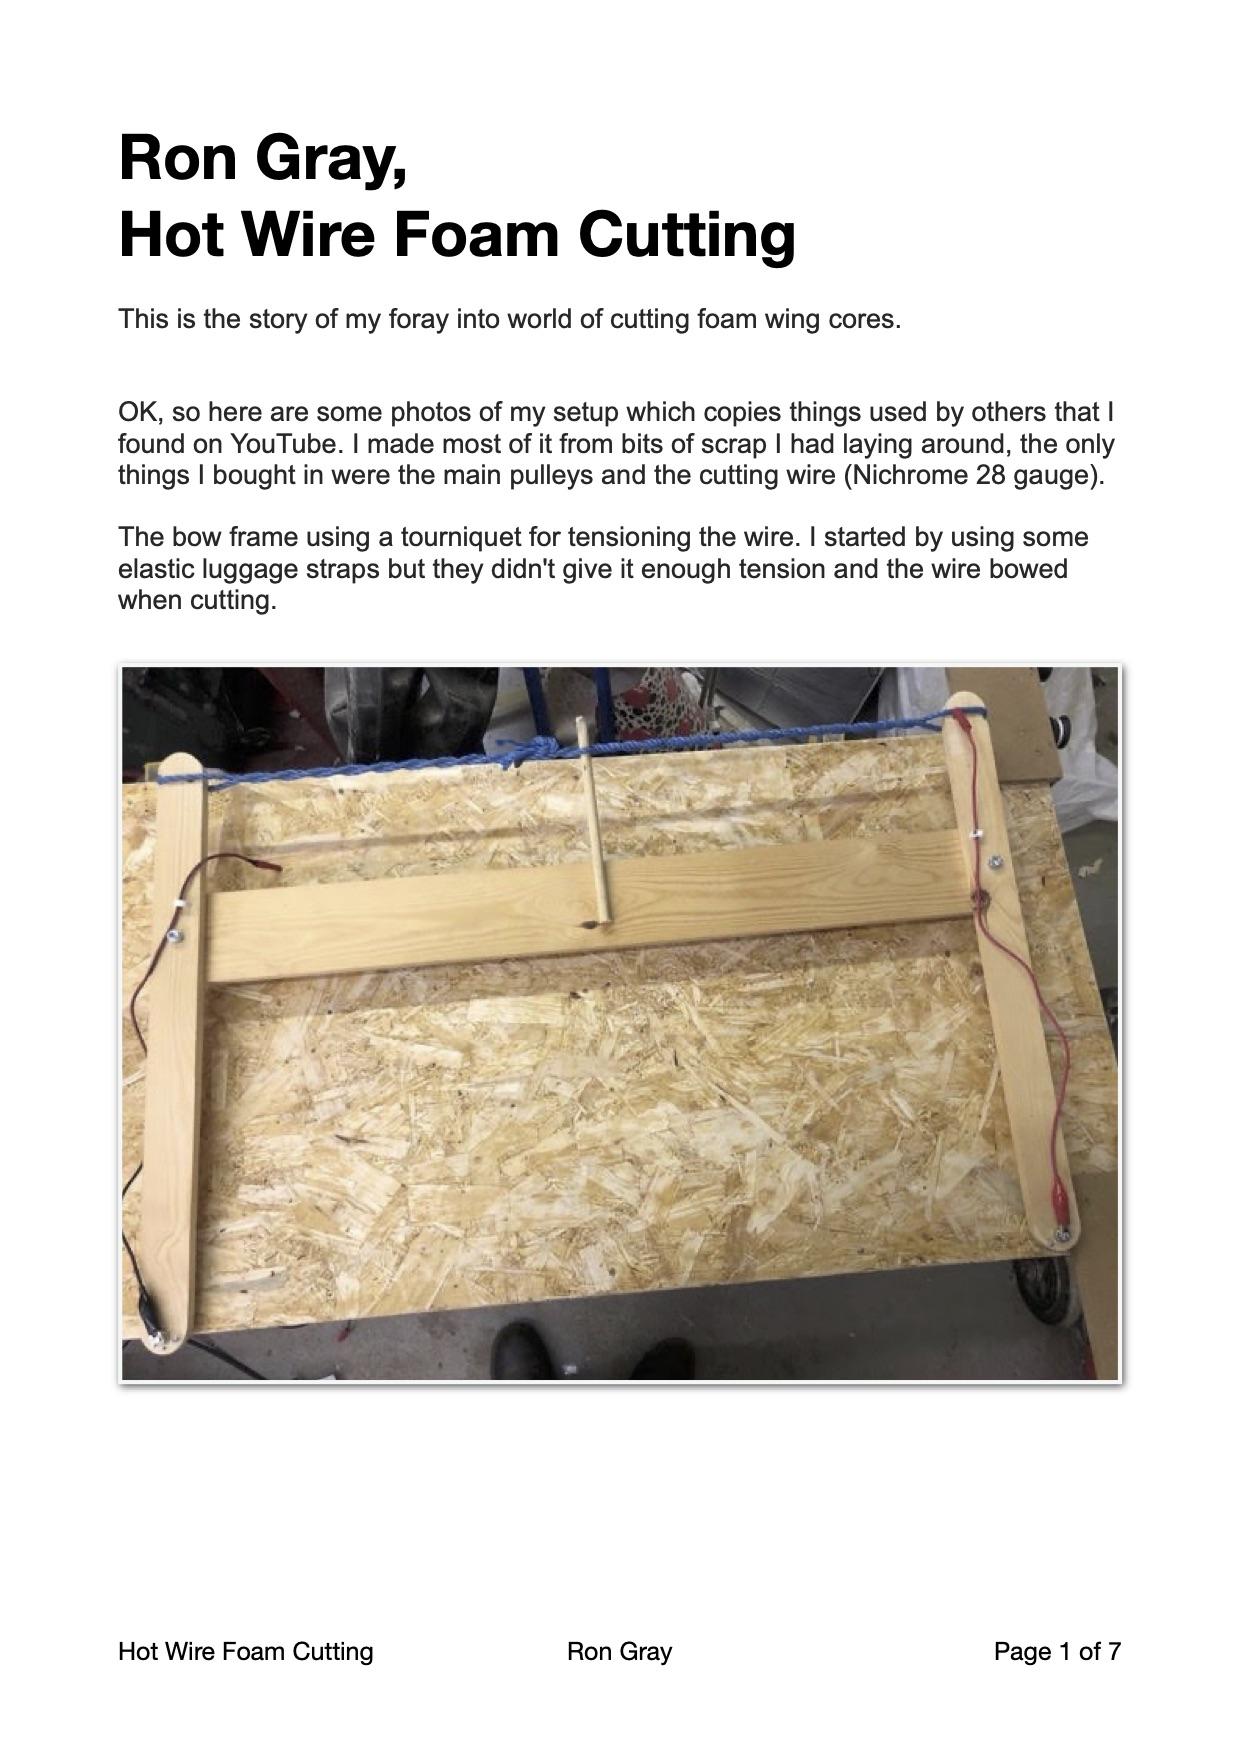 "Ron Gray - Hot Wire Foam Cutting 20201126, updated 20201207"" width="